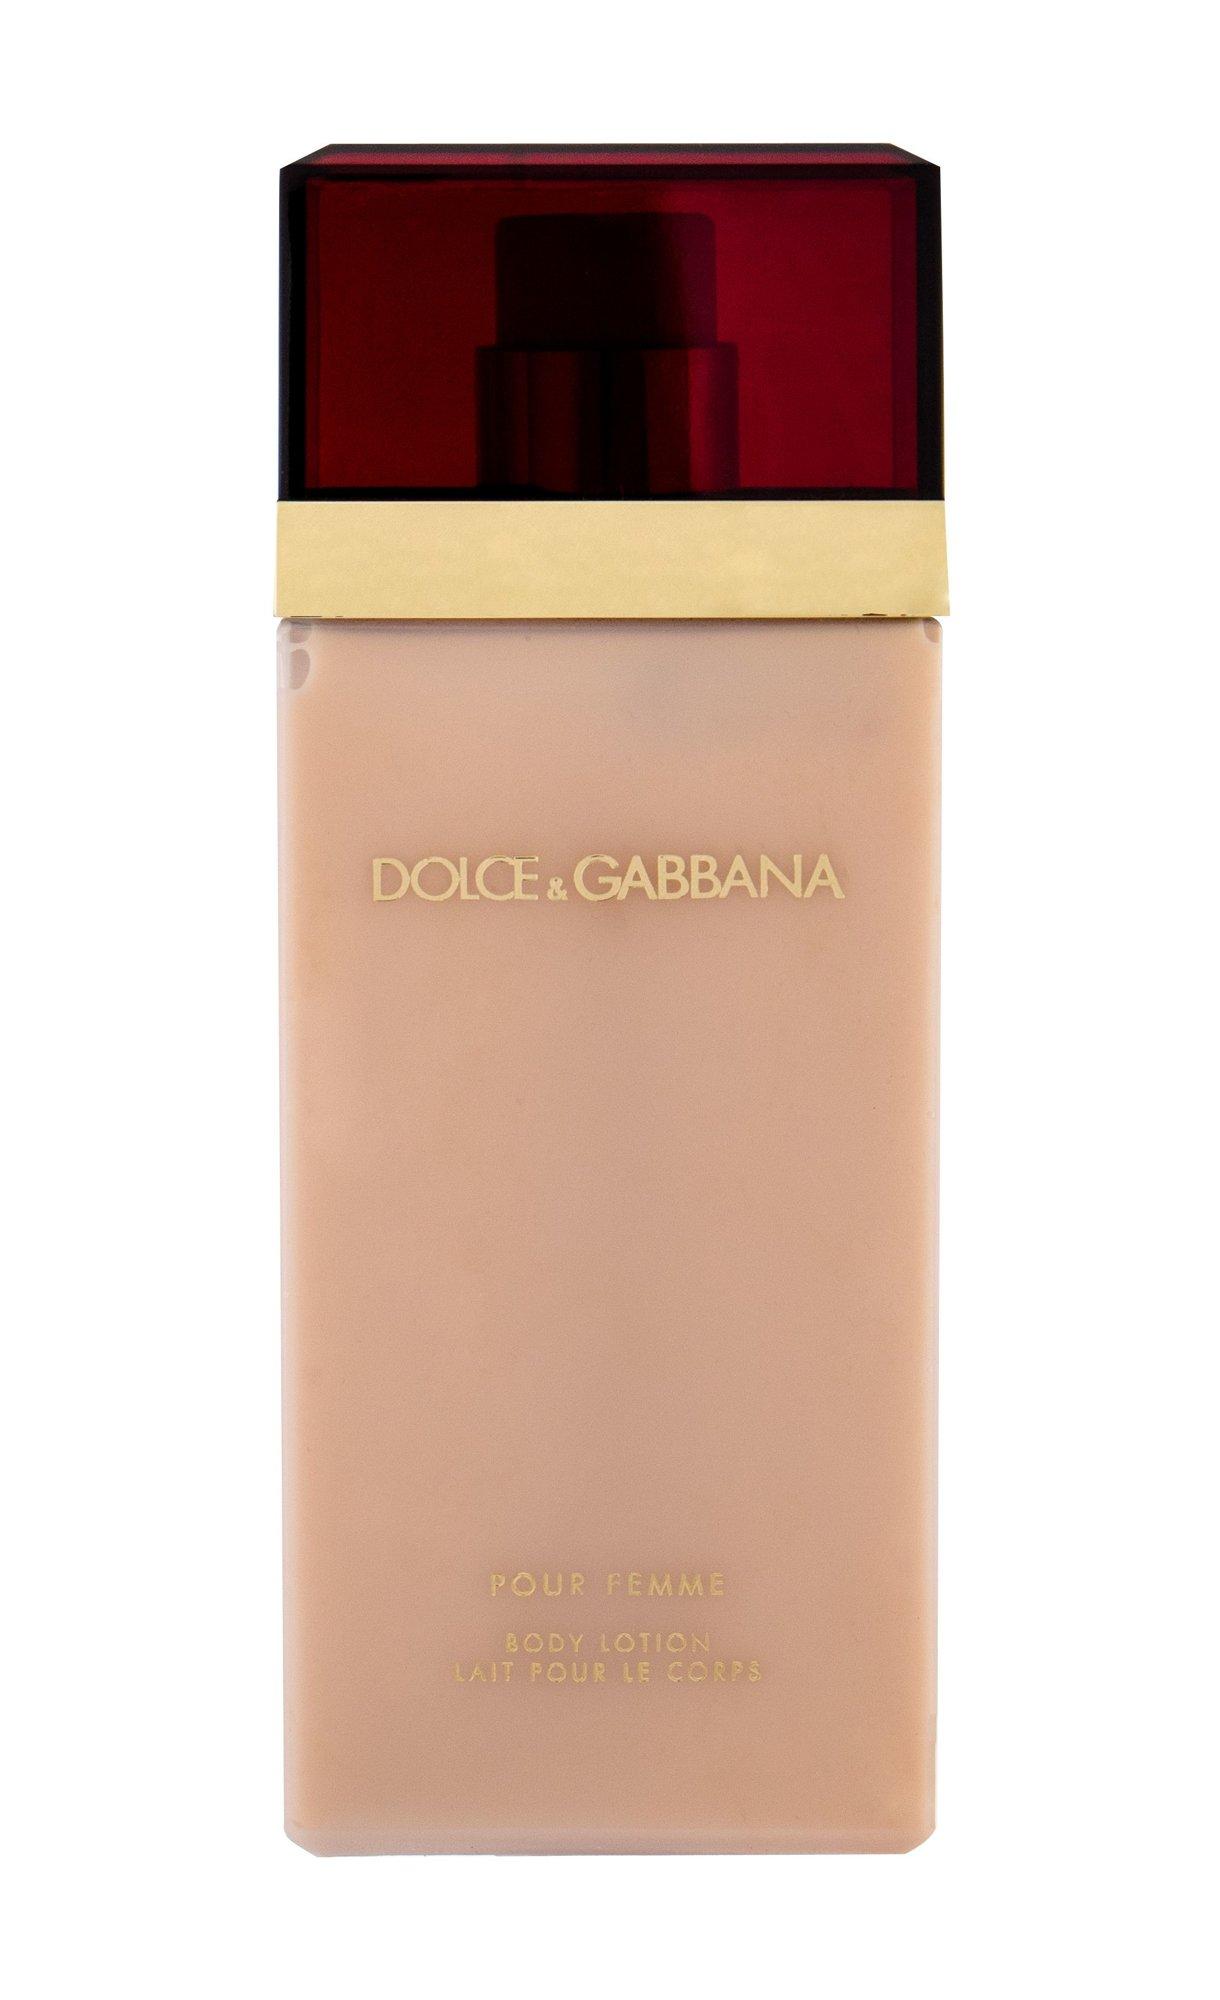 Dolce&Gabbana Pour Femme Body Lotion 250ml